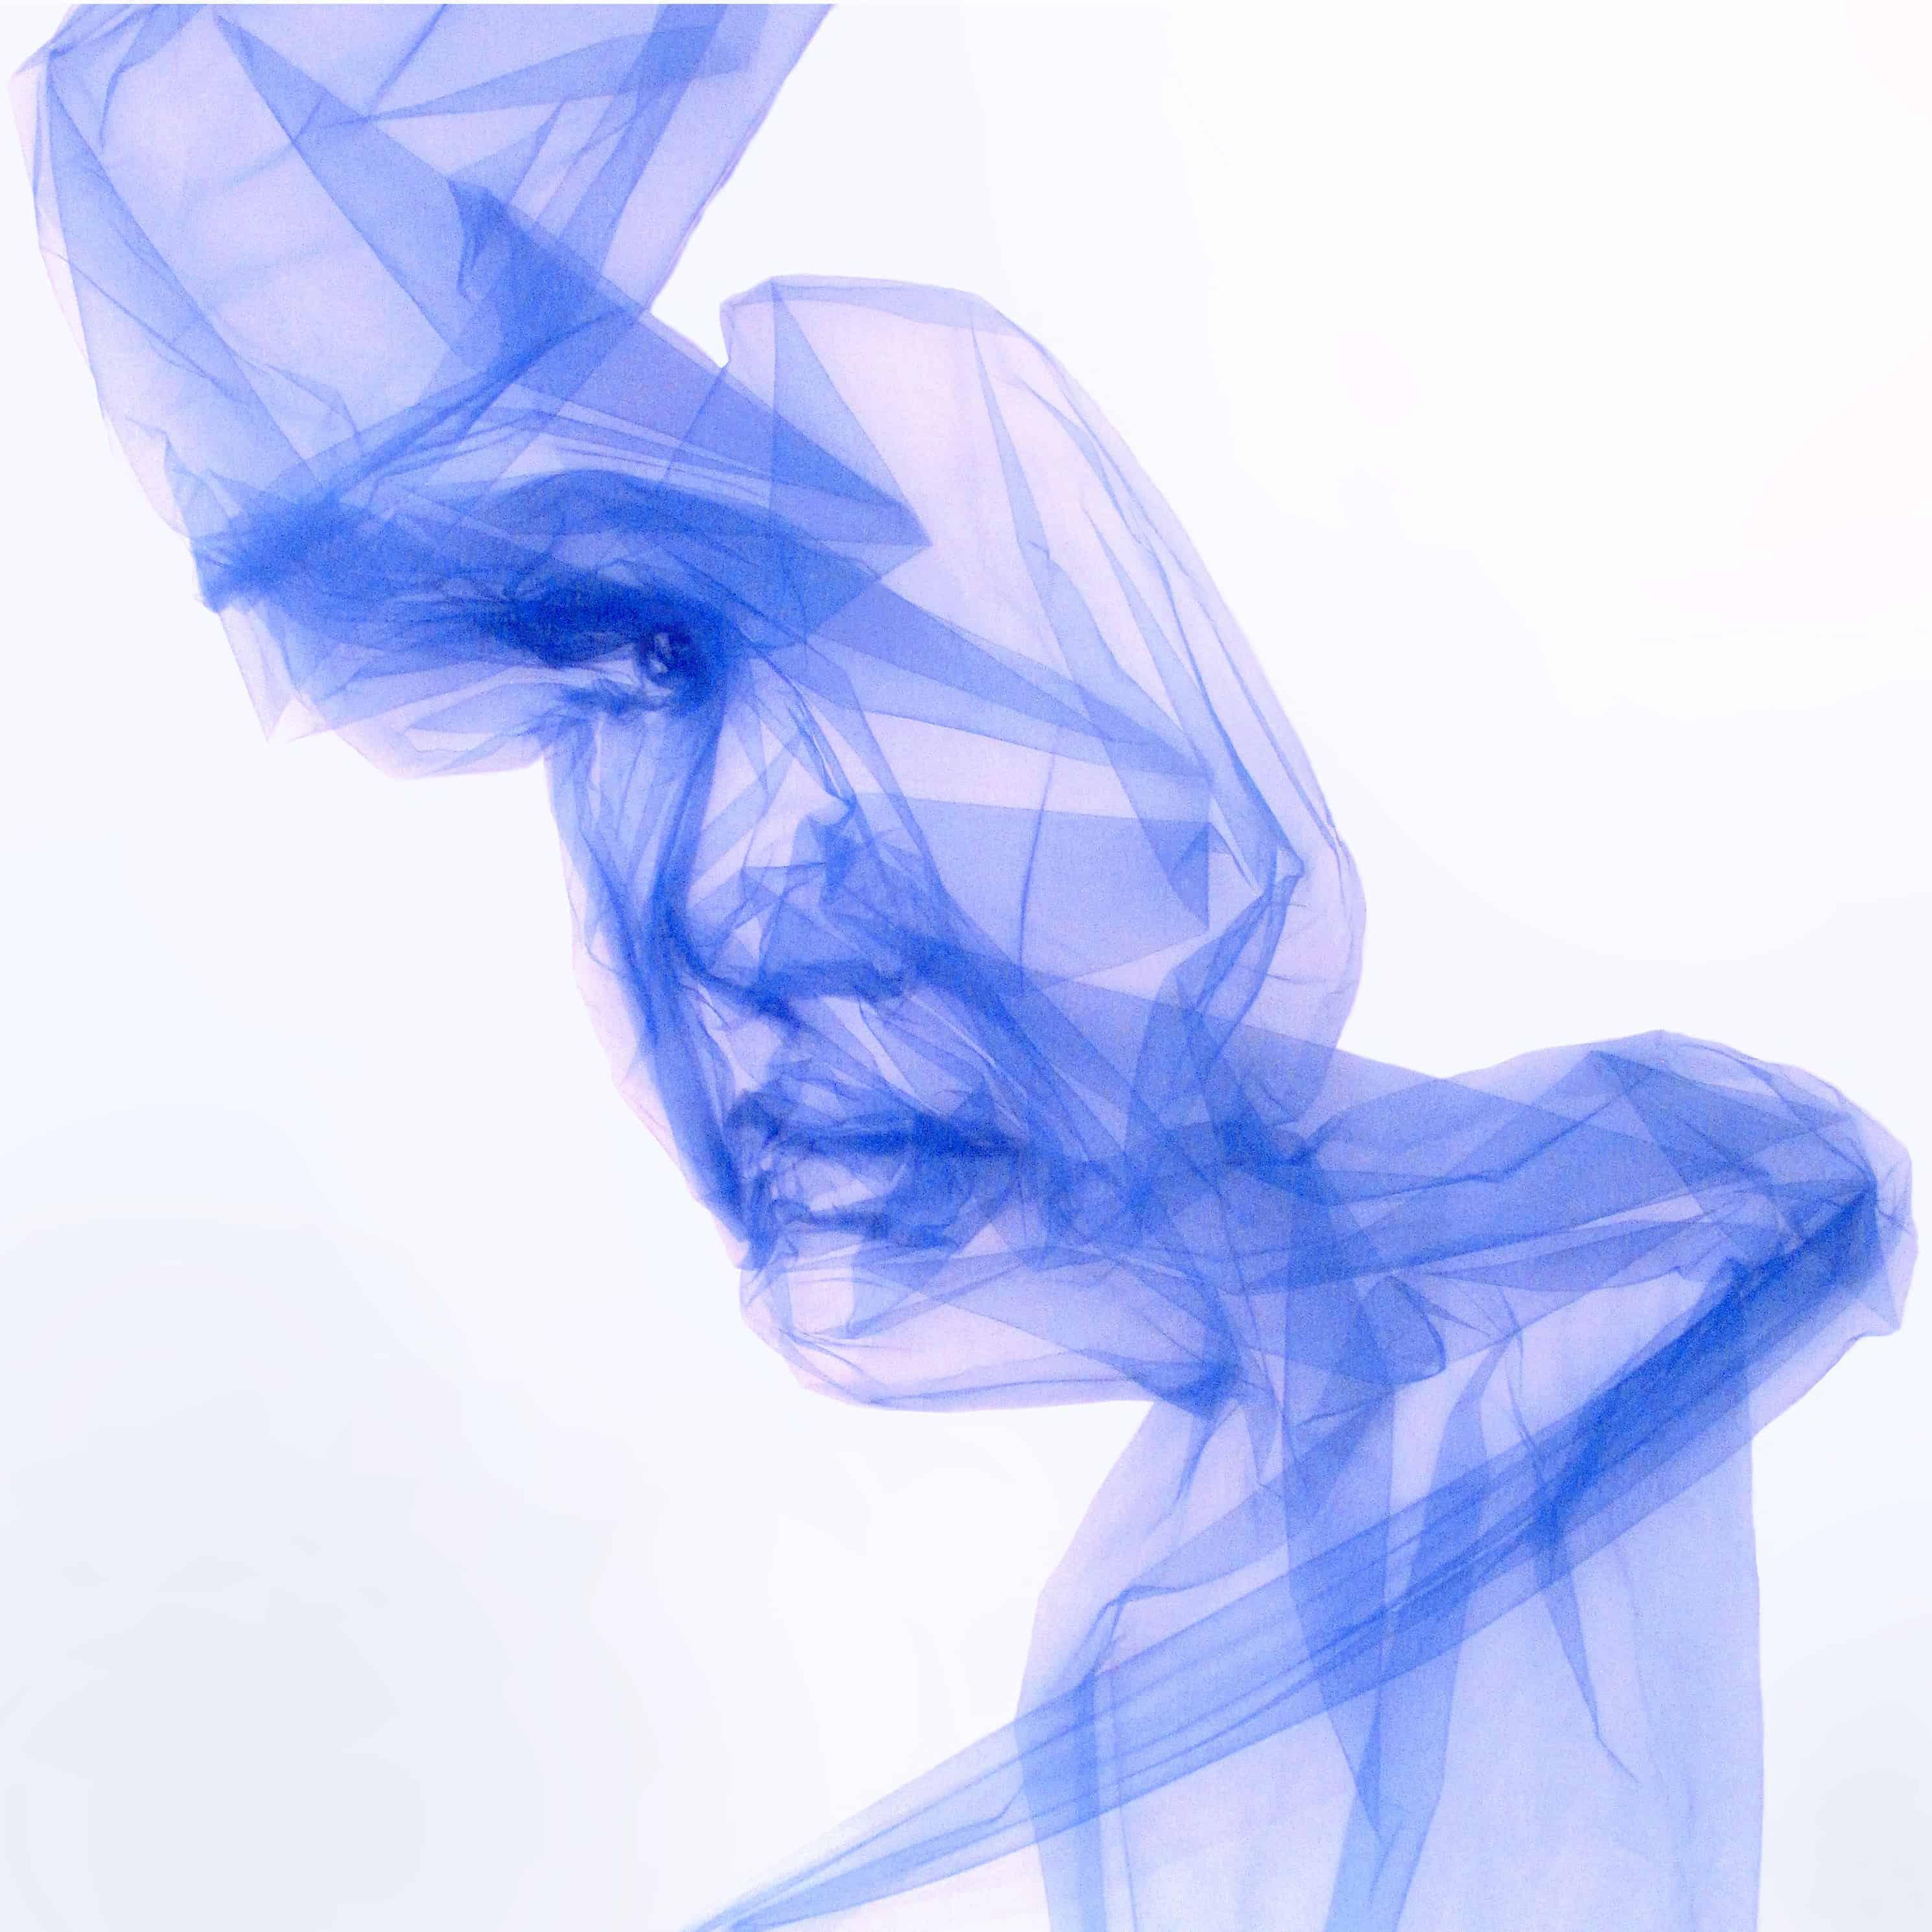 Benjamin Shine - Flow image gallery